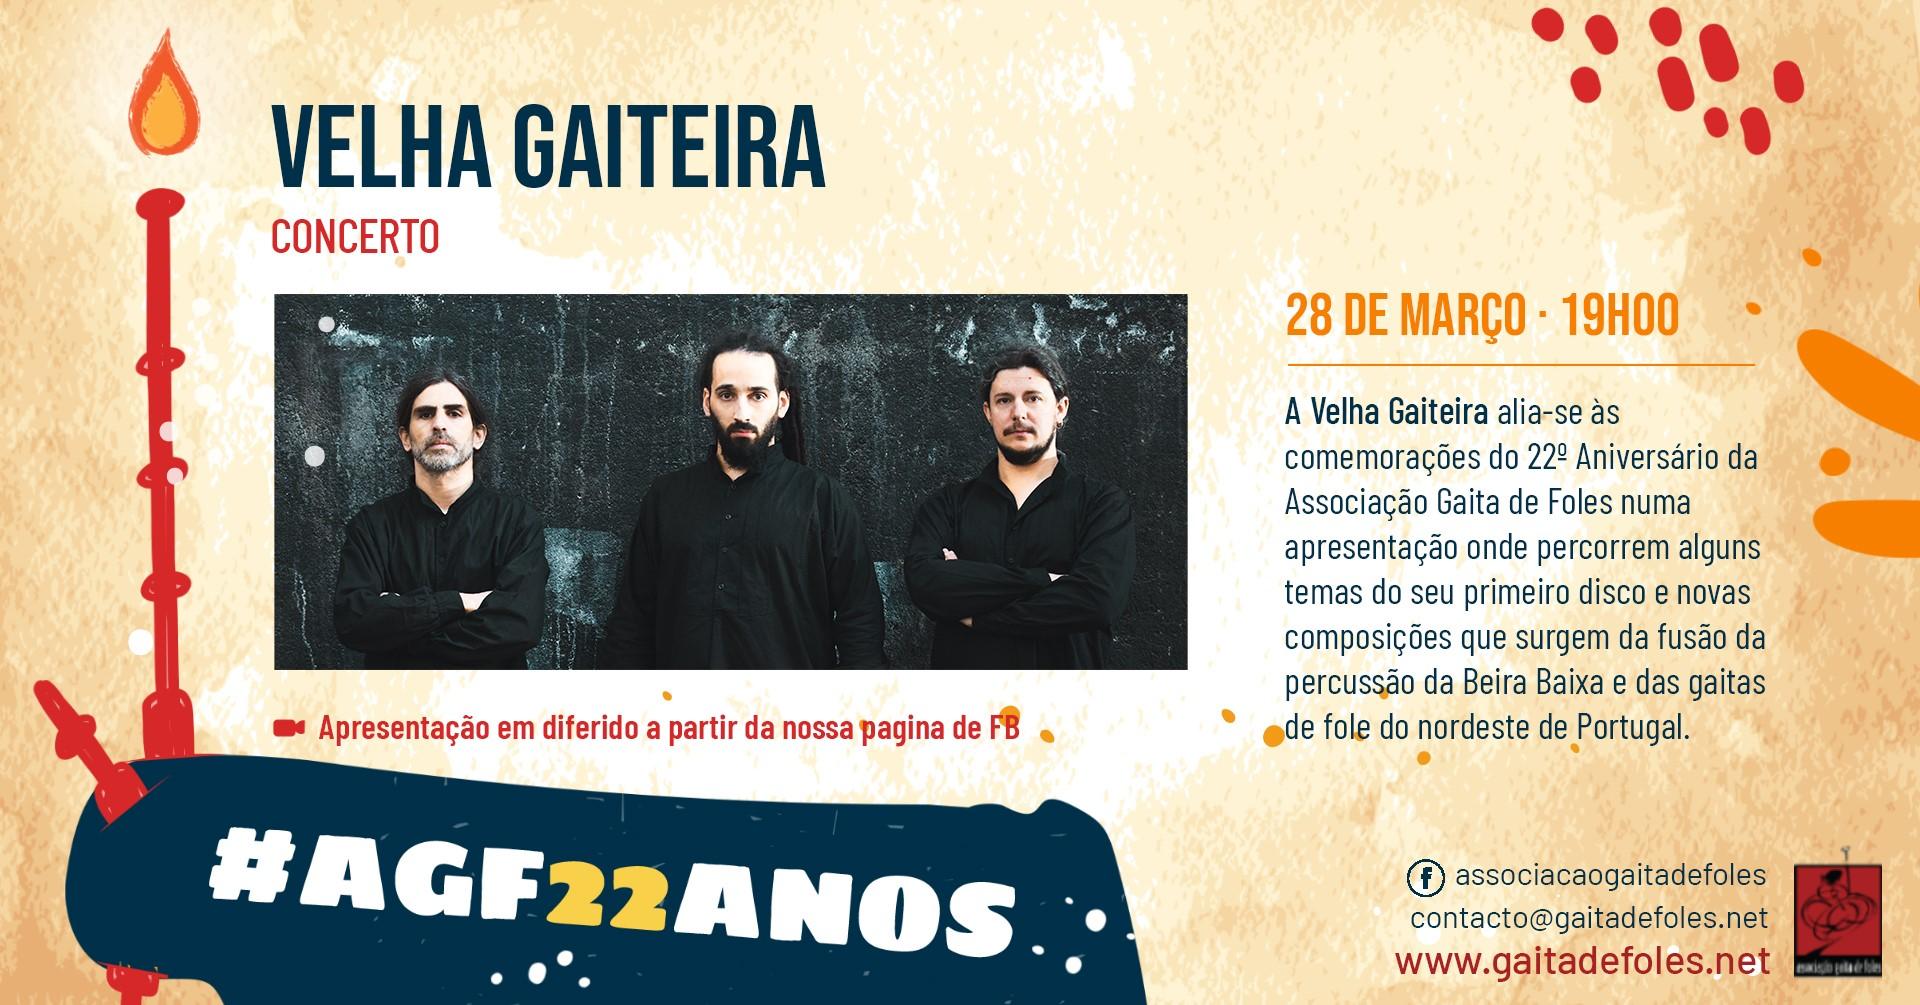 Velha Gaiteira - Concerto On-line